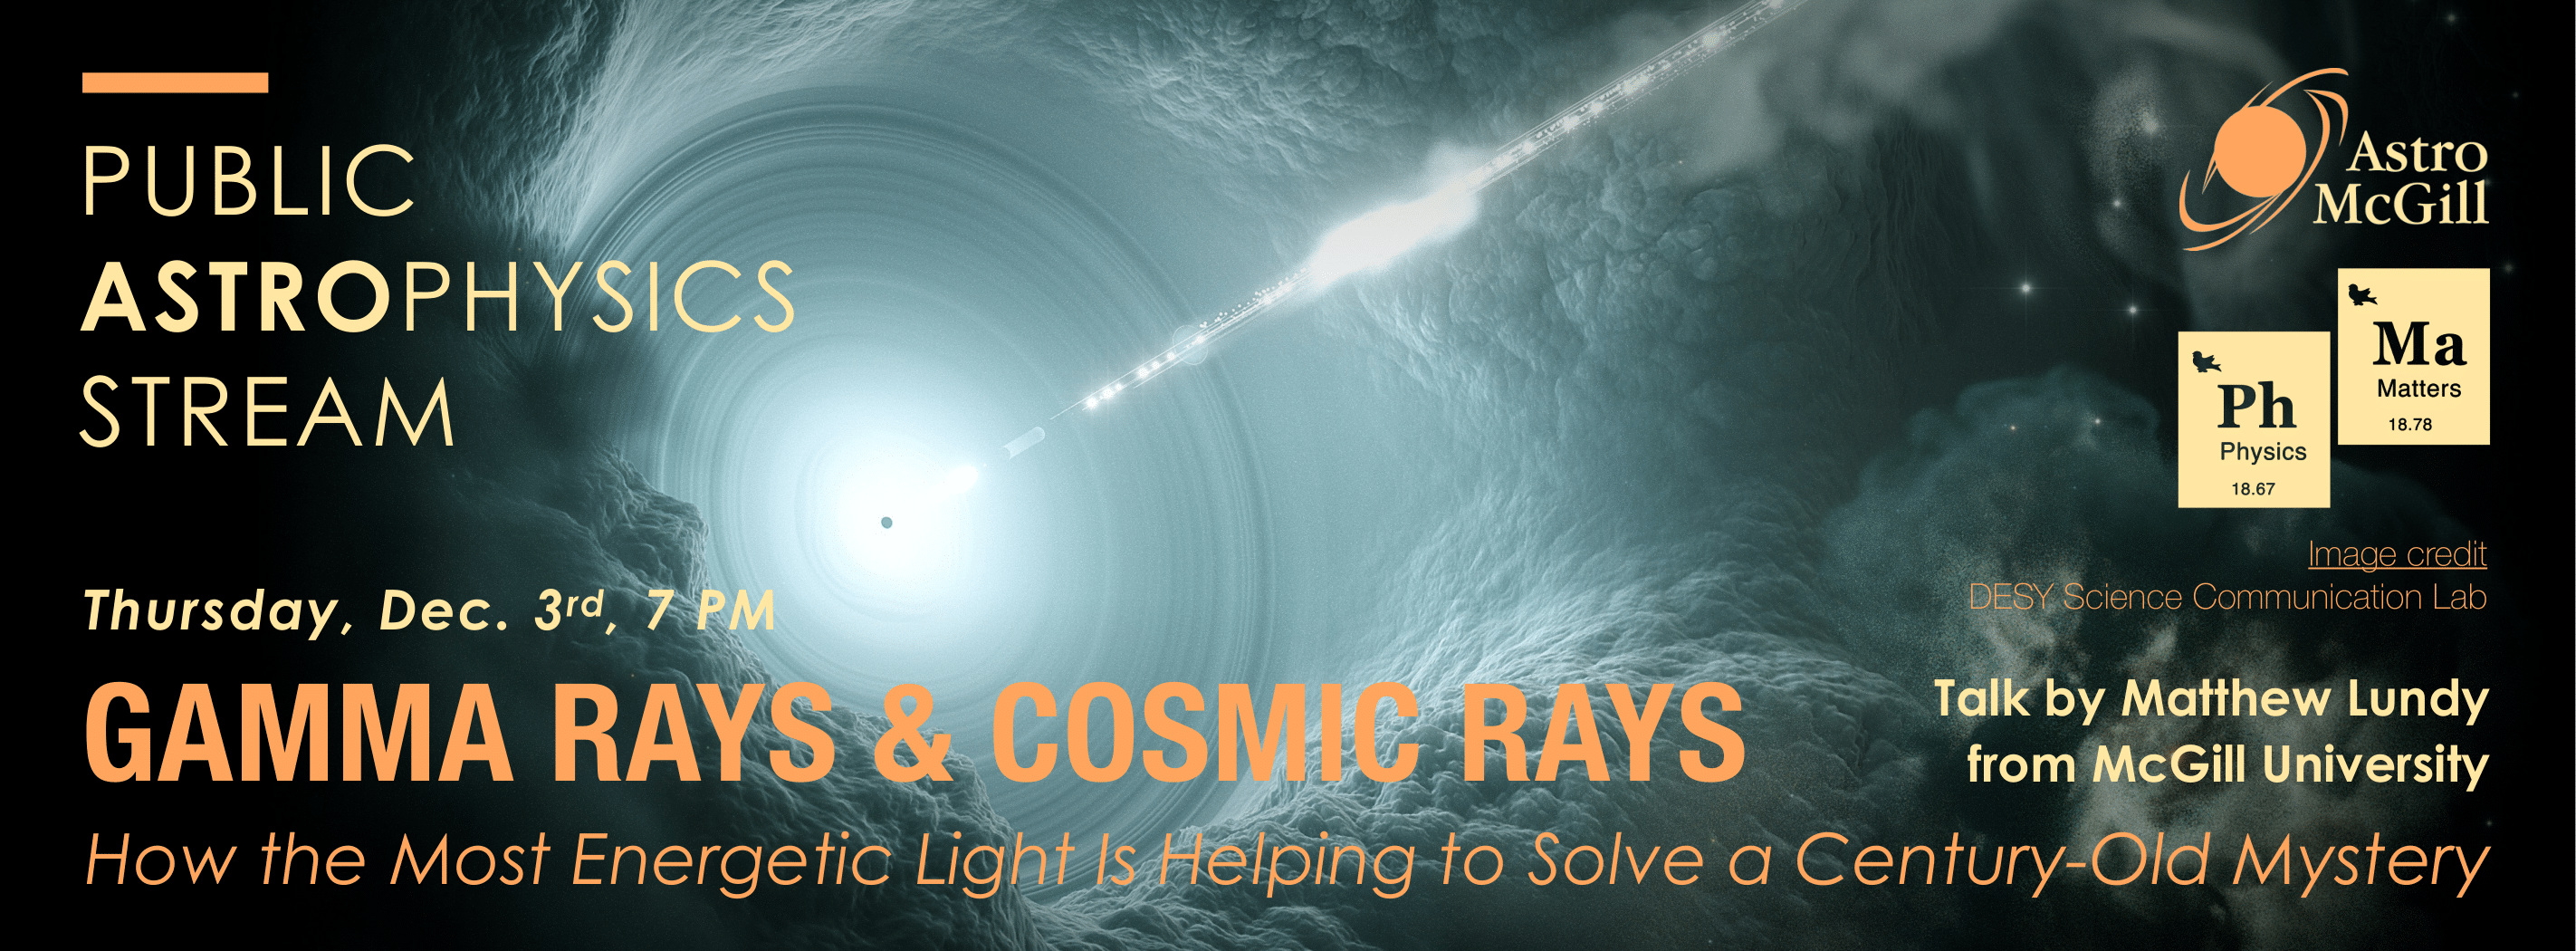 Gamma Rays & Cosmic Rays